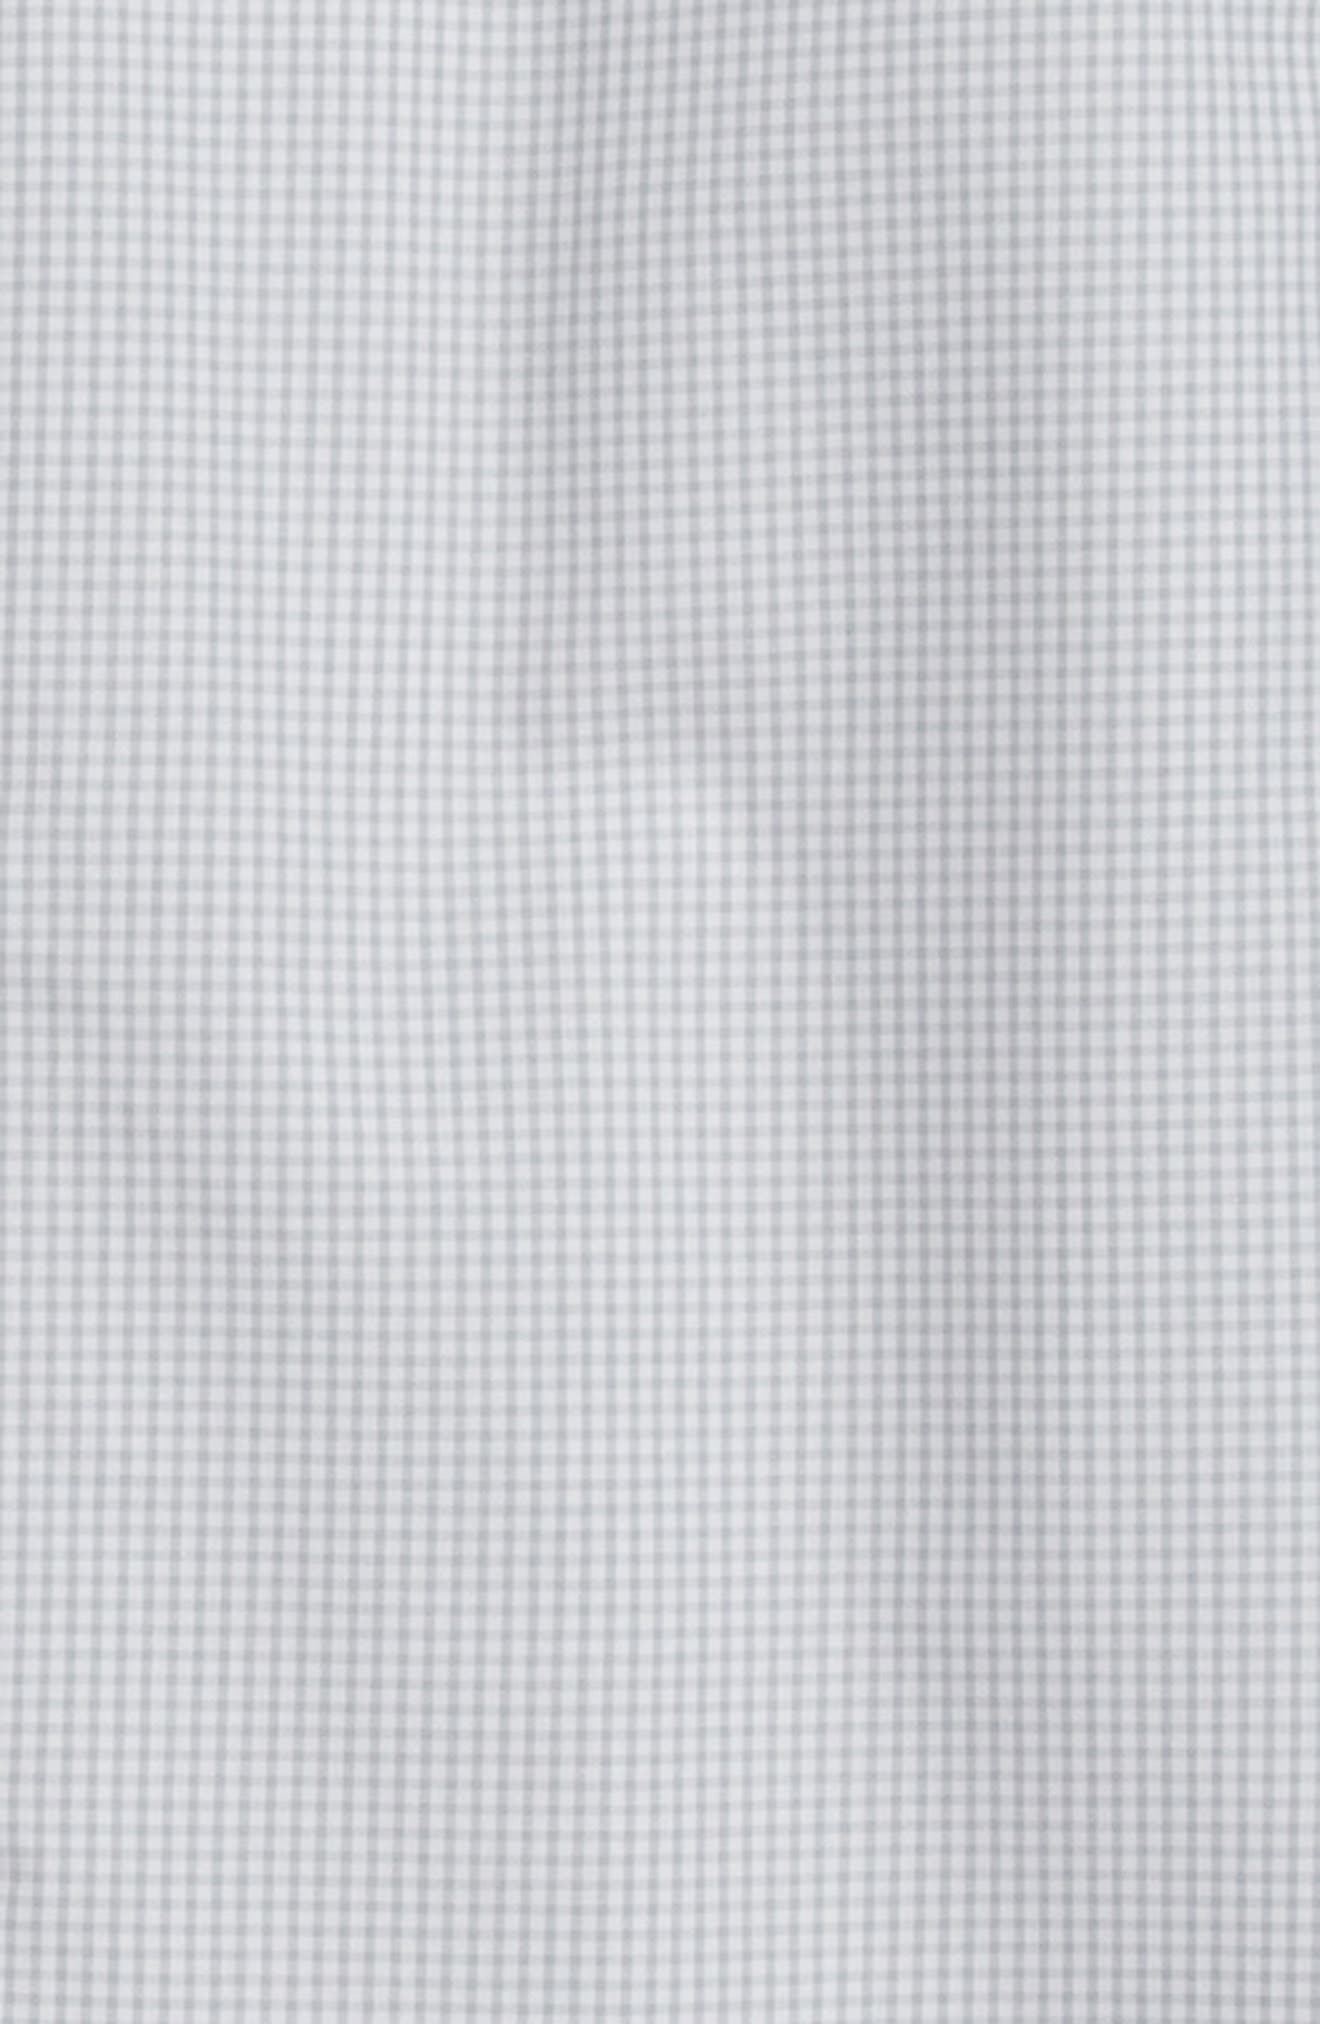 Check Dress Shirt,                             Alternate thumbnail 2, color,                             032